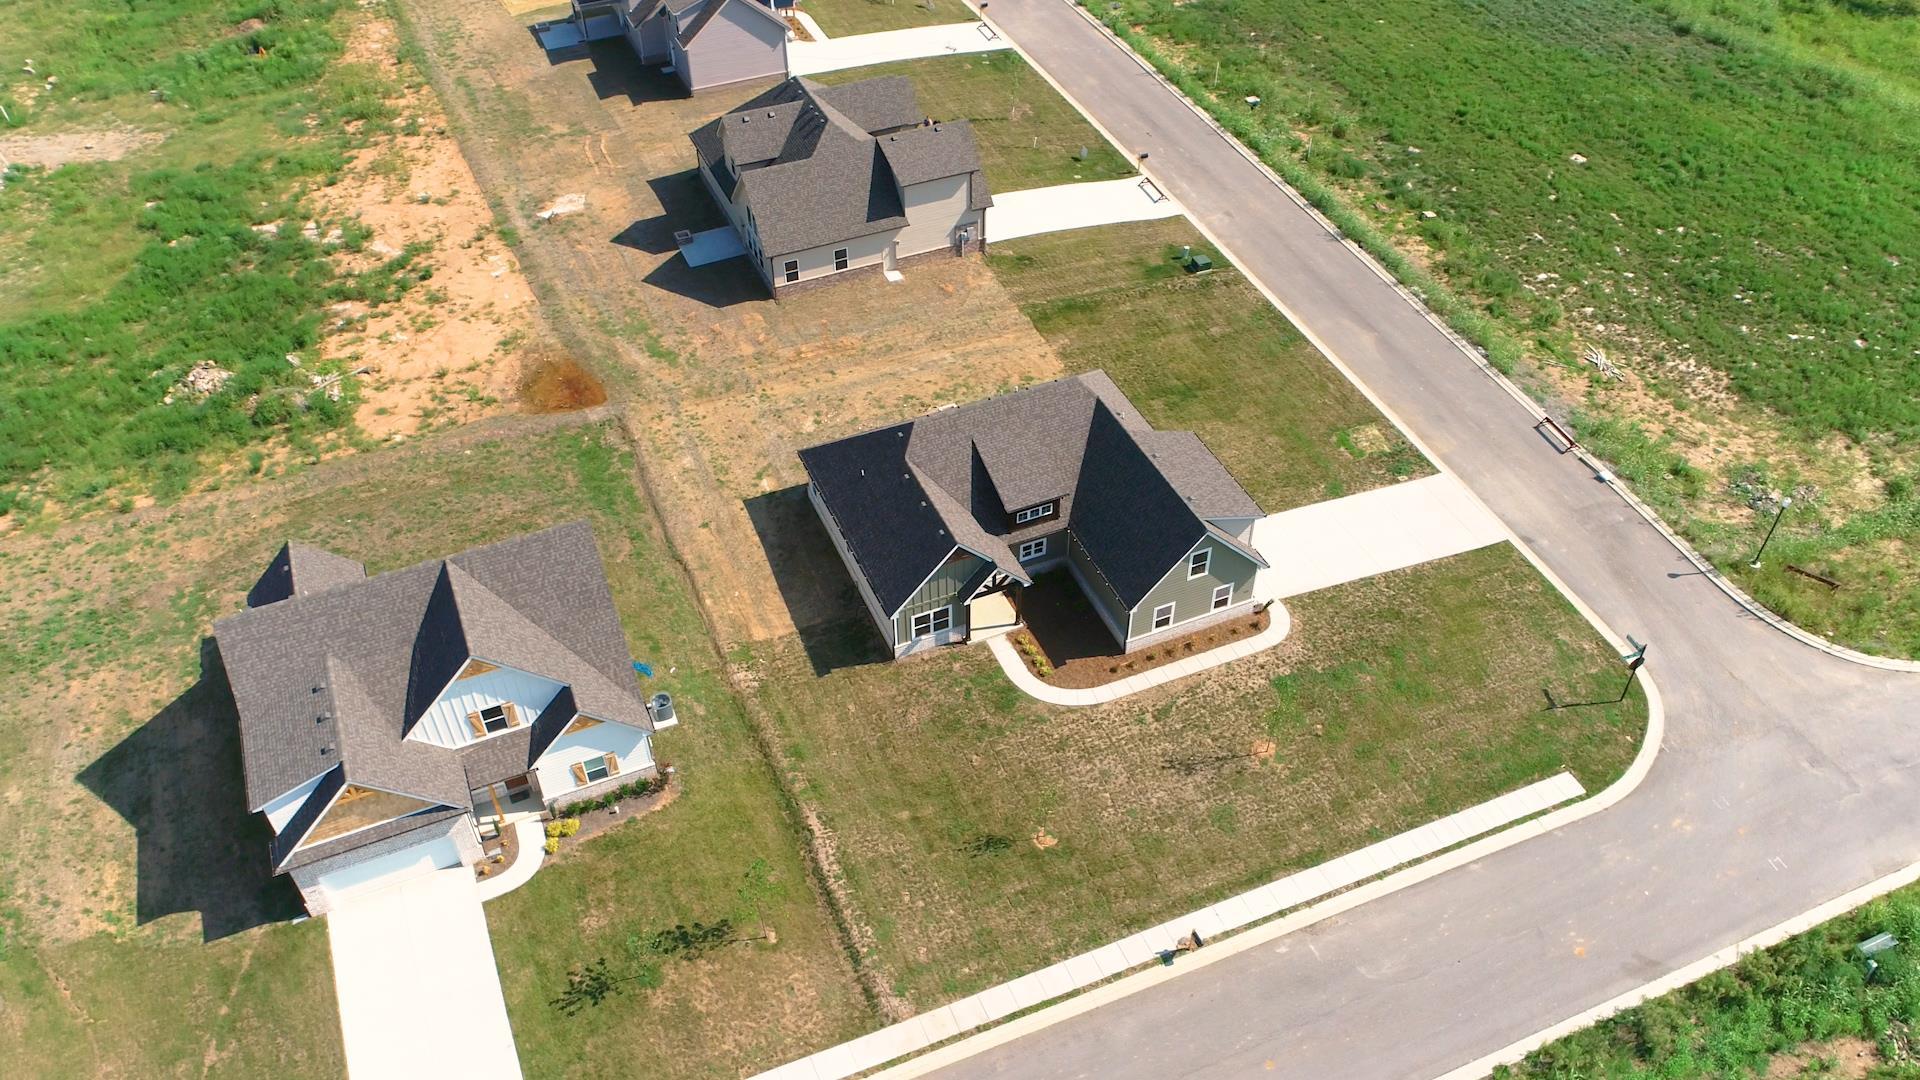 421 Peak Top Tr (Lot 151), LA VERGNE, TN 37086 - LA VERGNE, TN real estate listing